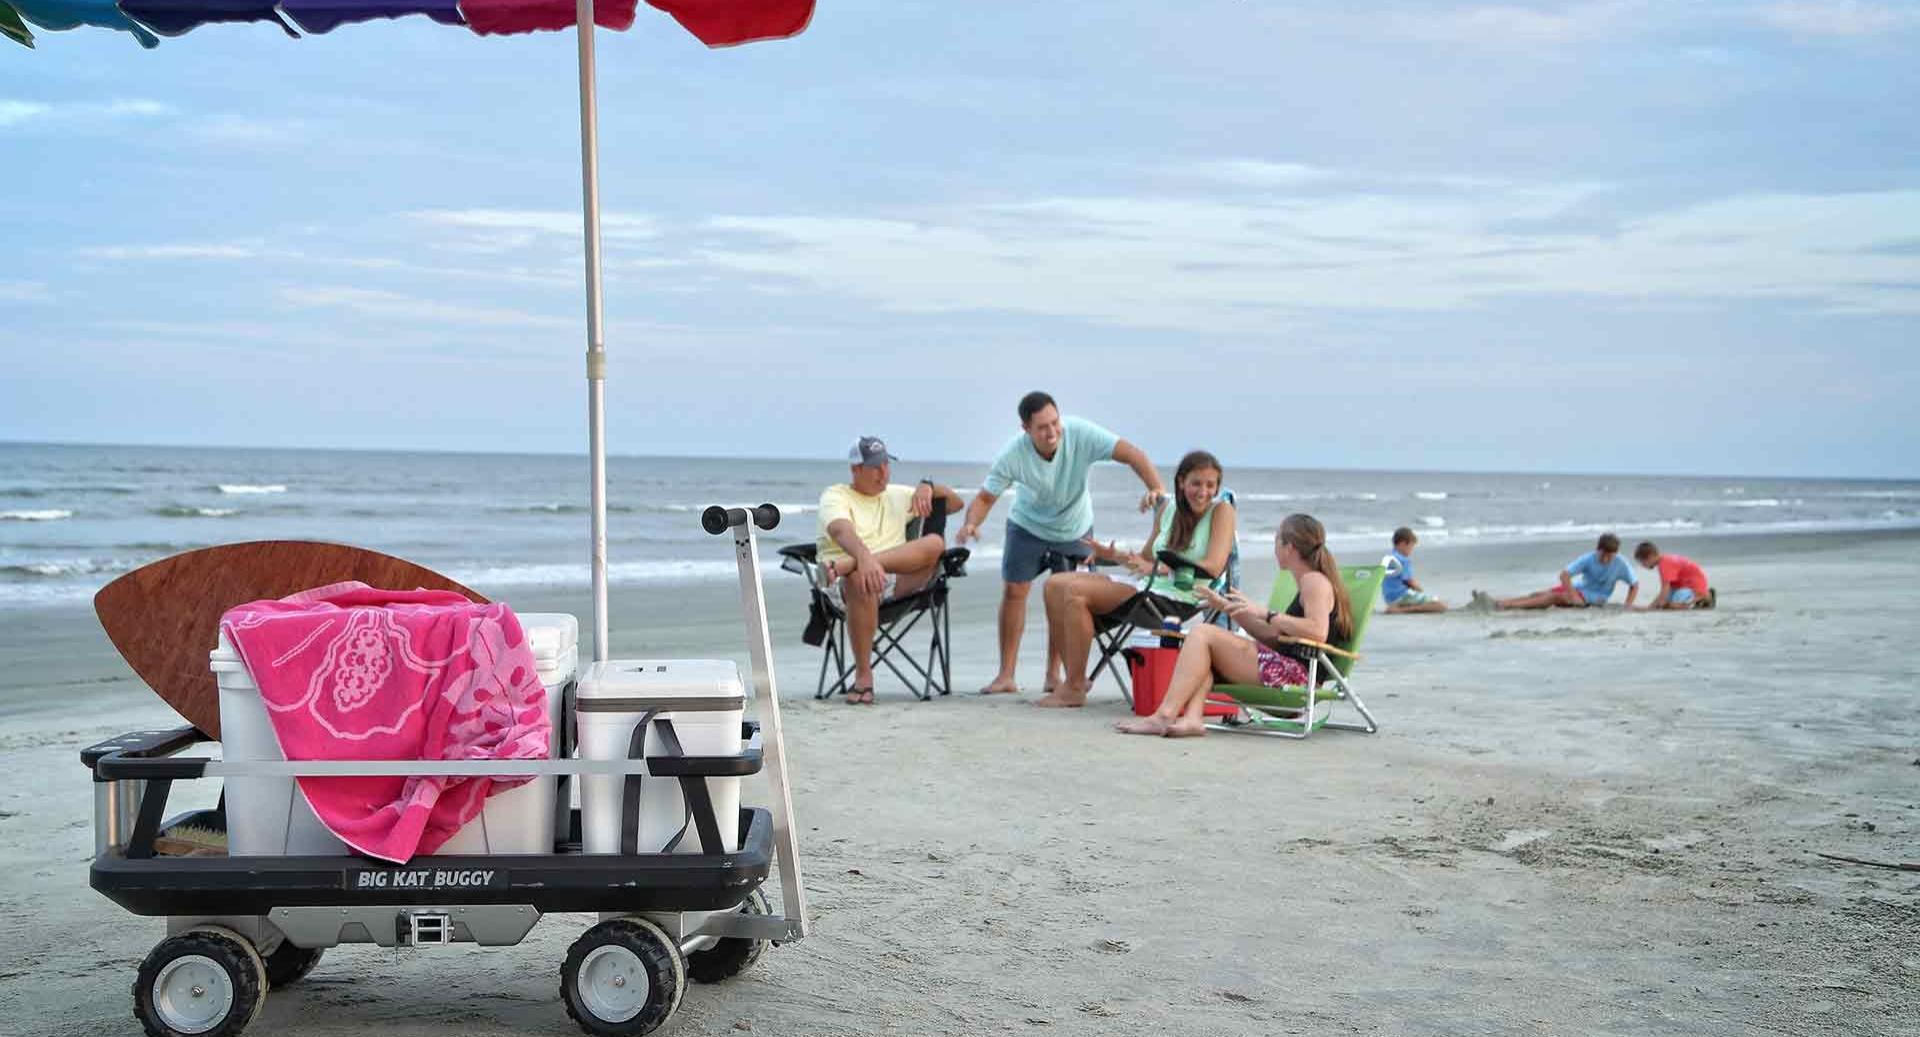 The Big Kat Buggy at the beach